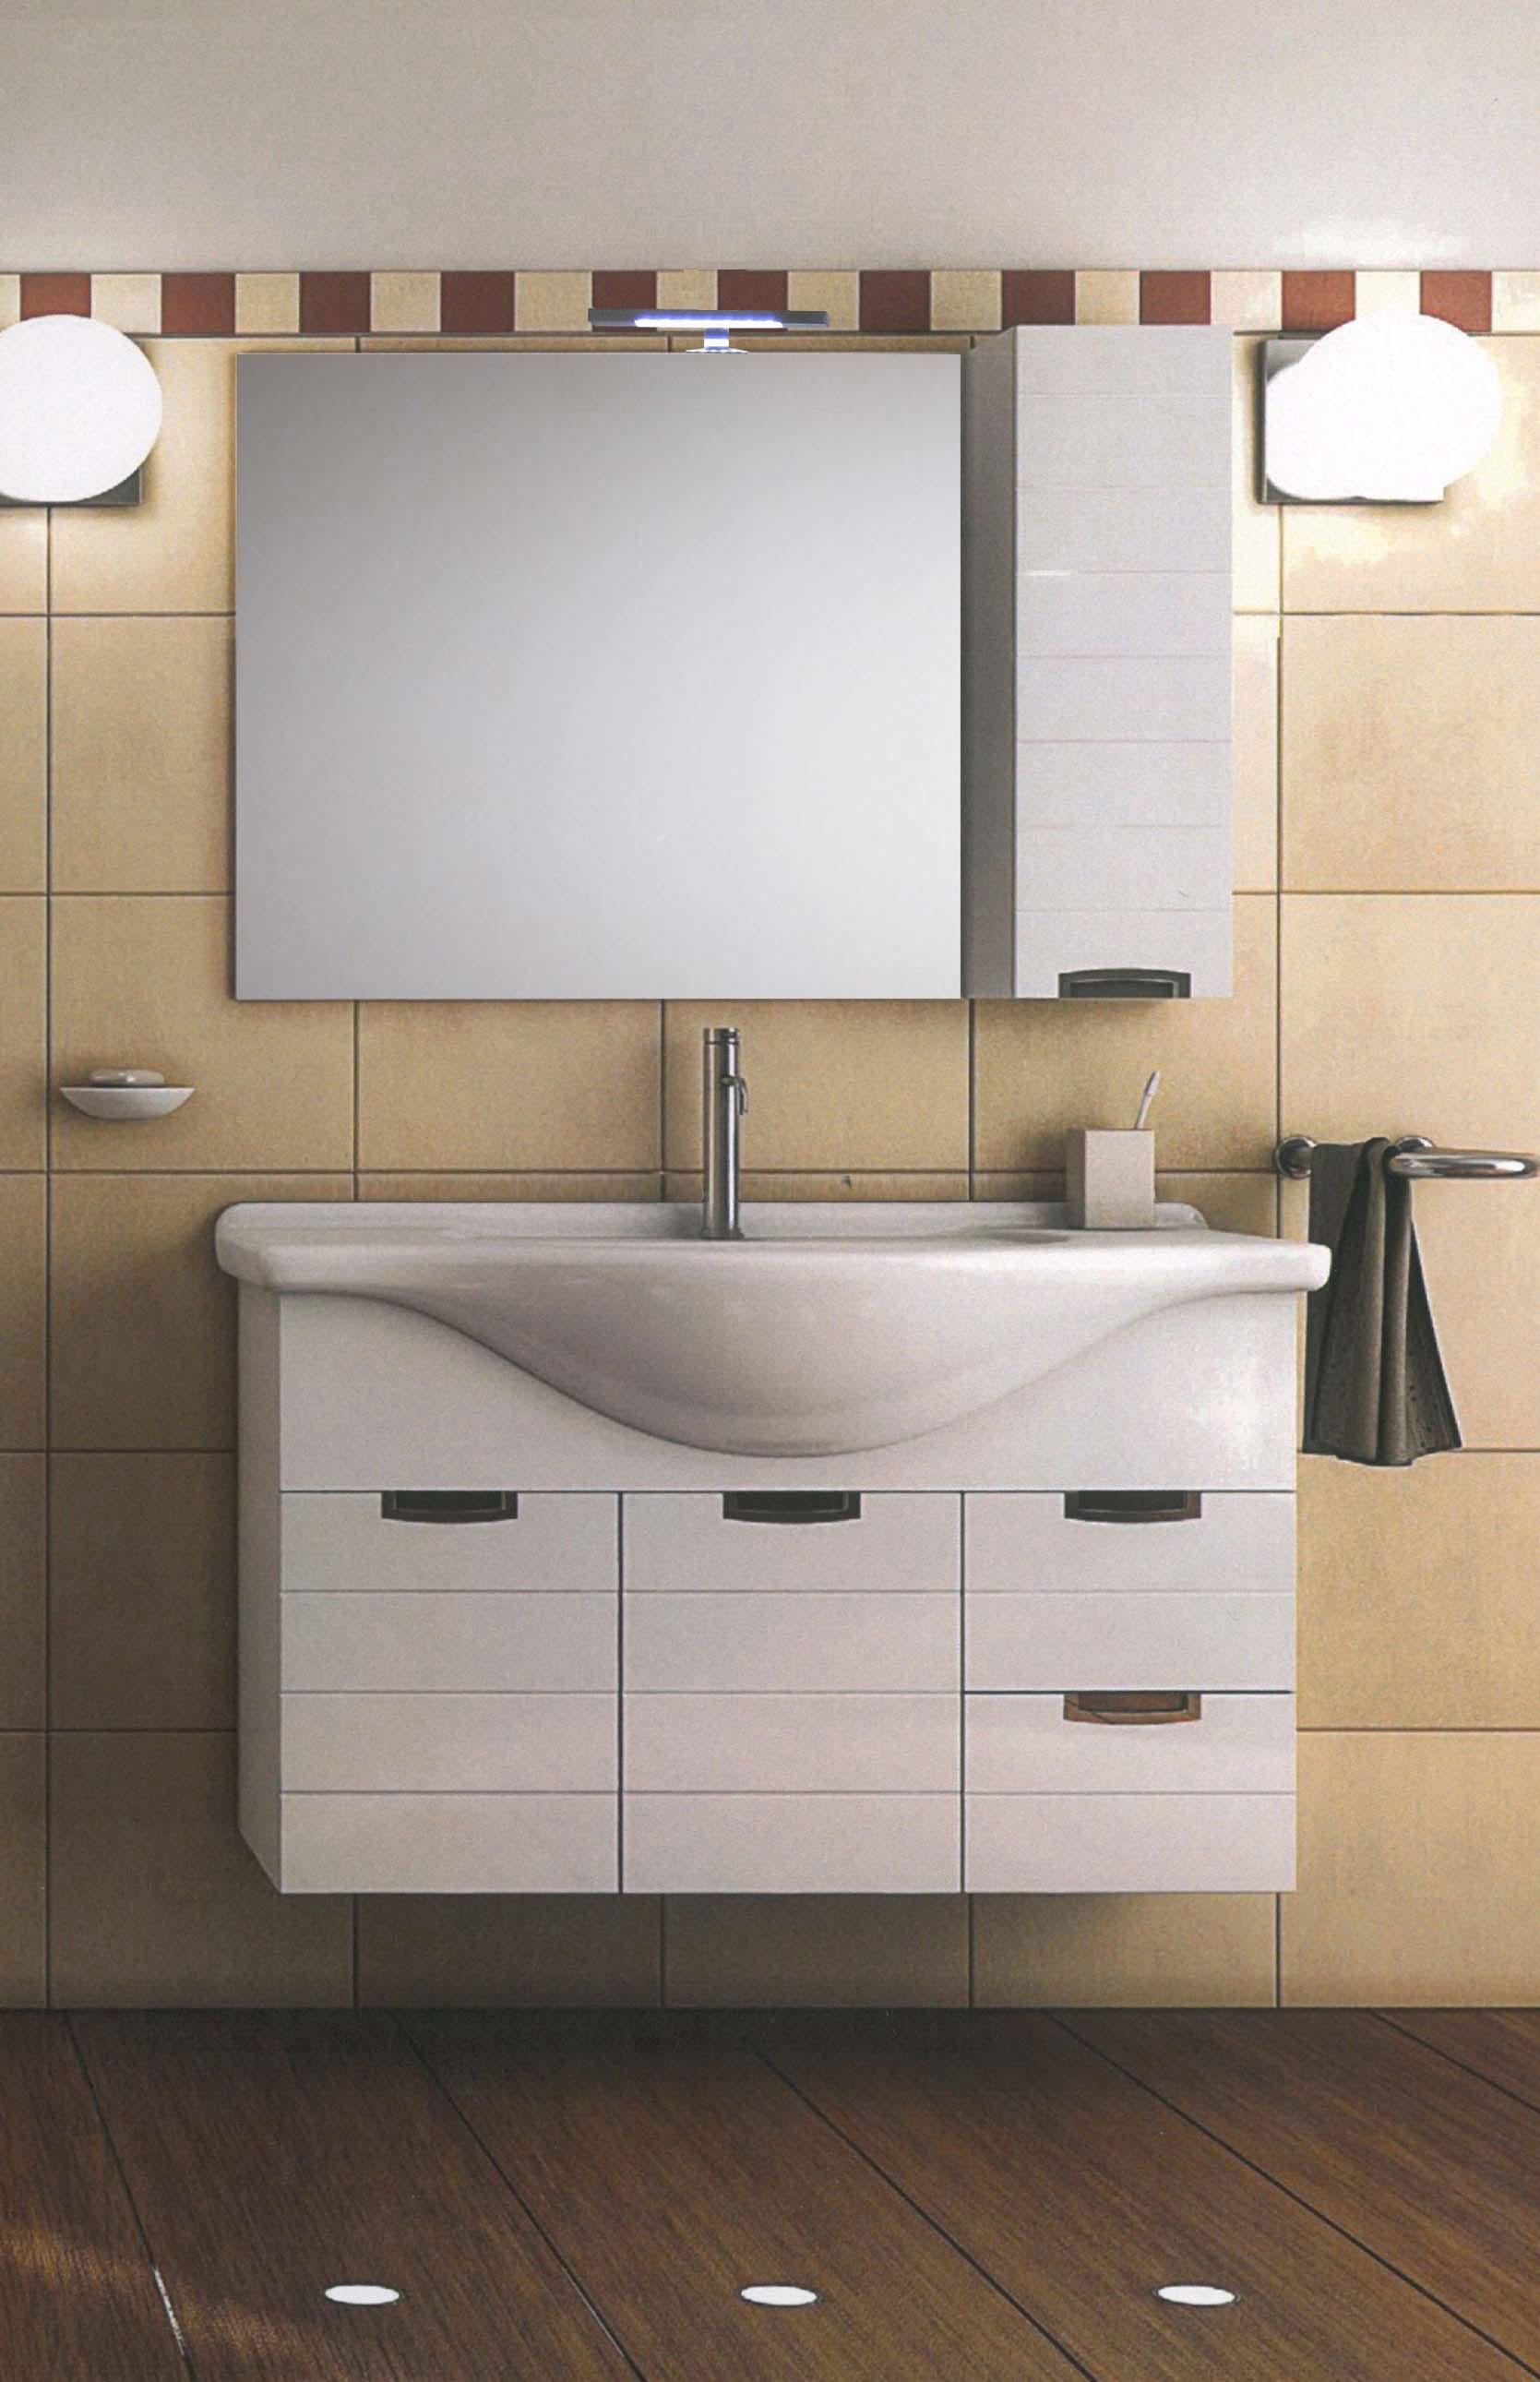 Savini mobili bagno cool email with savini mobili bagno latest mobile bagno venus baden haus - Gaia mobili bagno prezzi ...